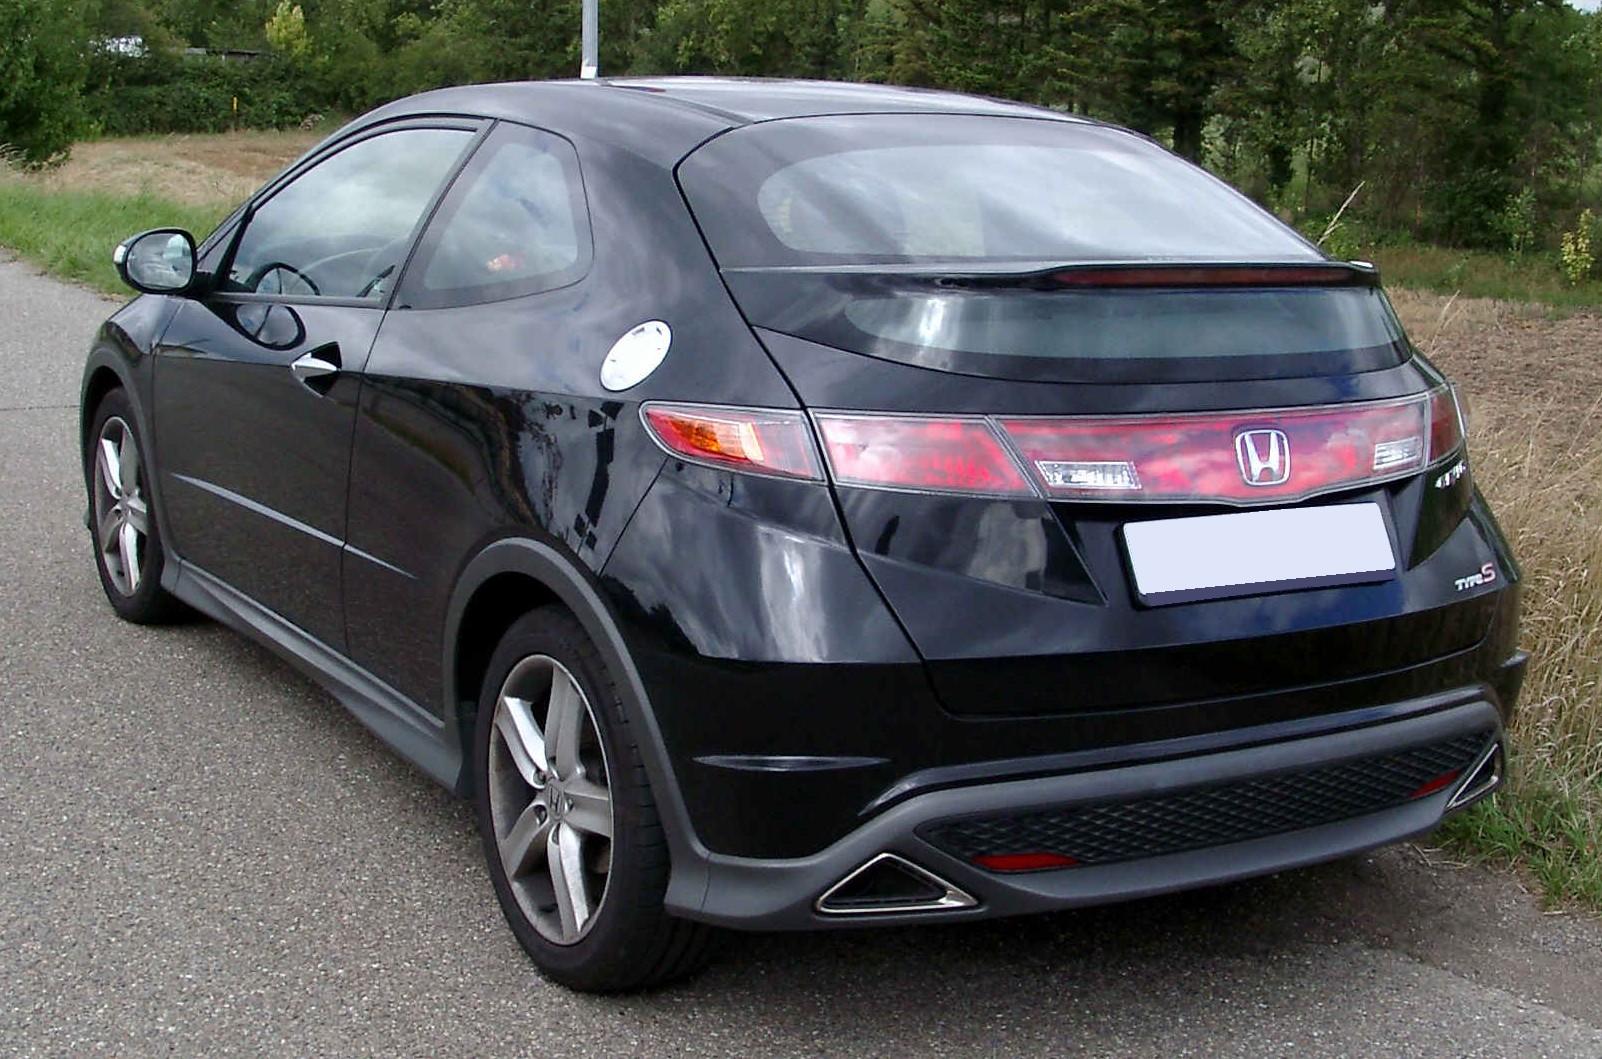 Honda has finally made the civic coupe fun again cars for Where are honda civics made